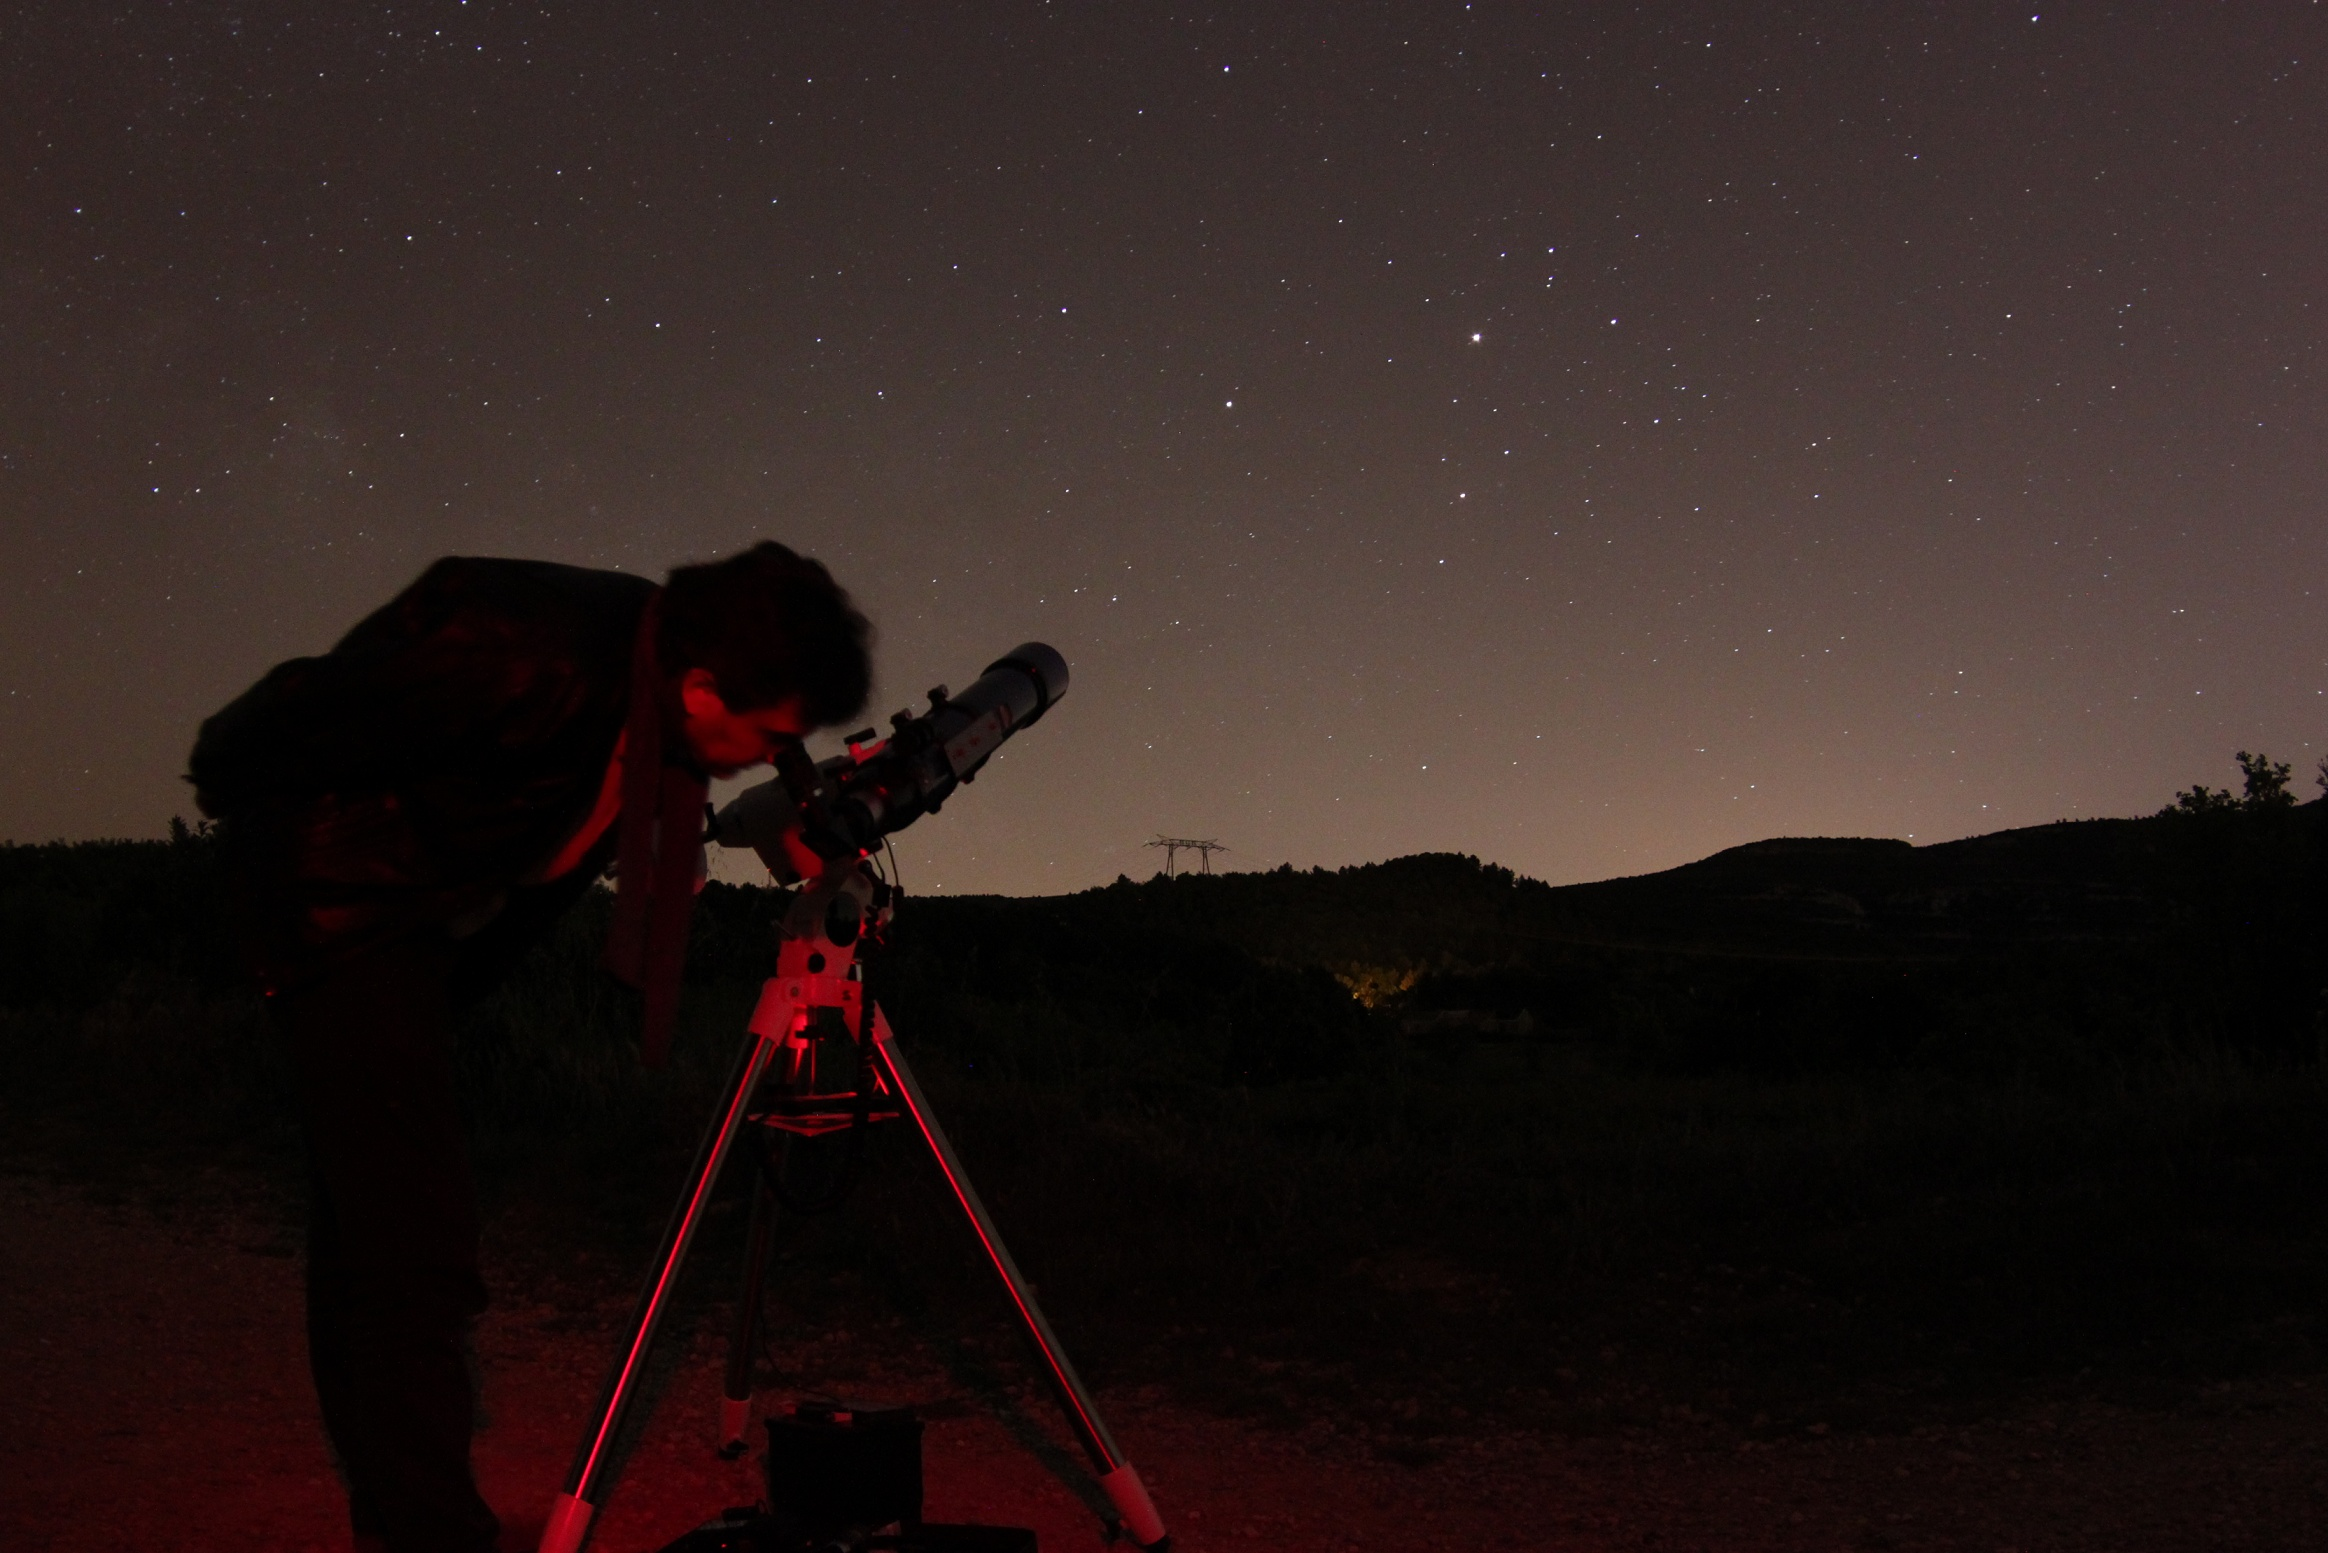 http://ekladata.com/3WPrO61O9UMYIXc1qzcliTprUlg/Pichauris-lionel-observe-Mars.jpg